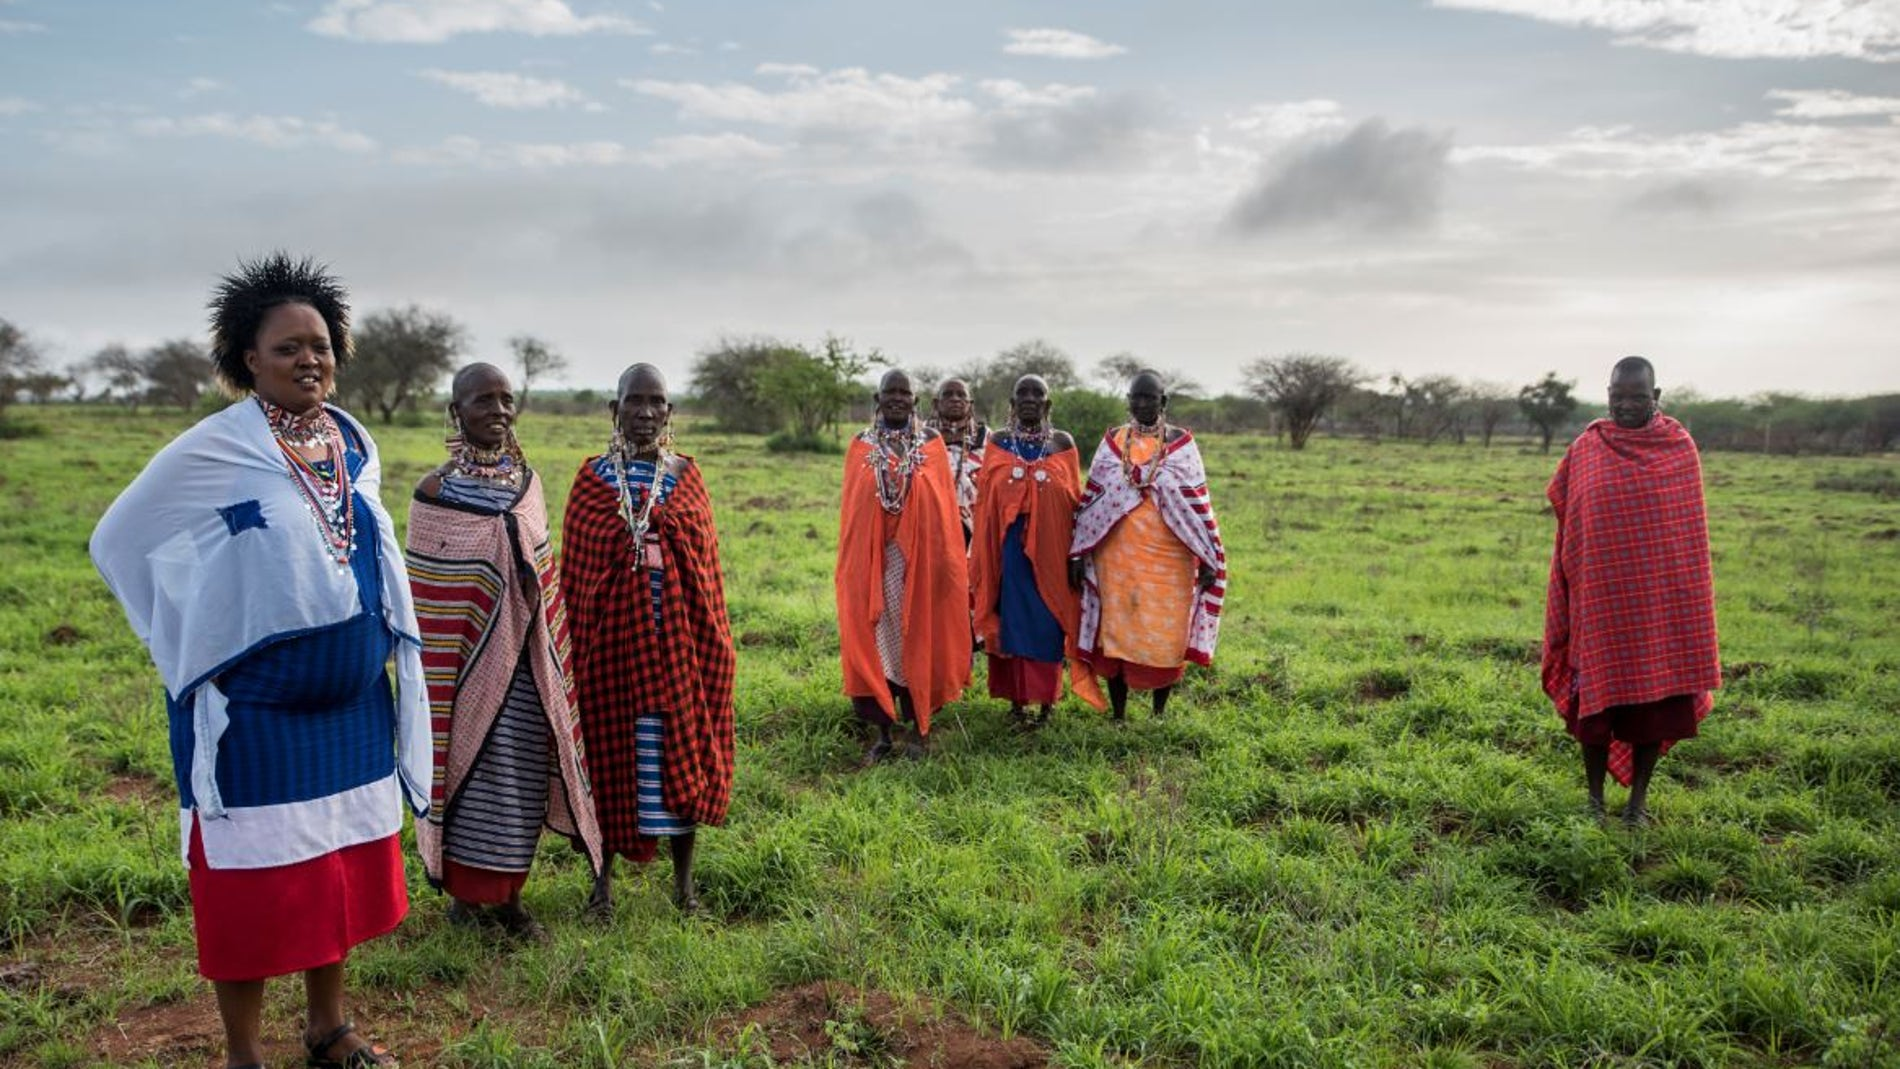 Mujeres masai en Kenia